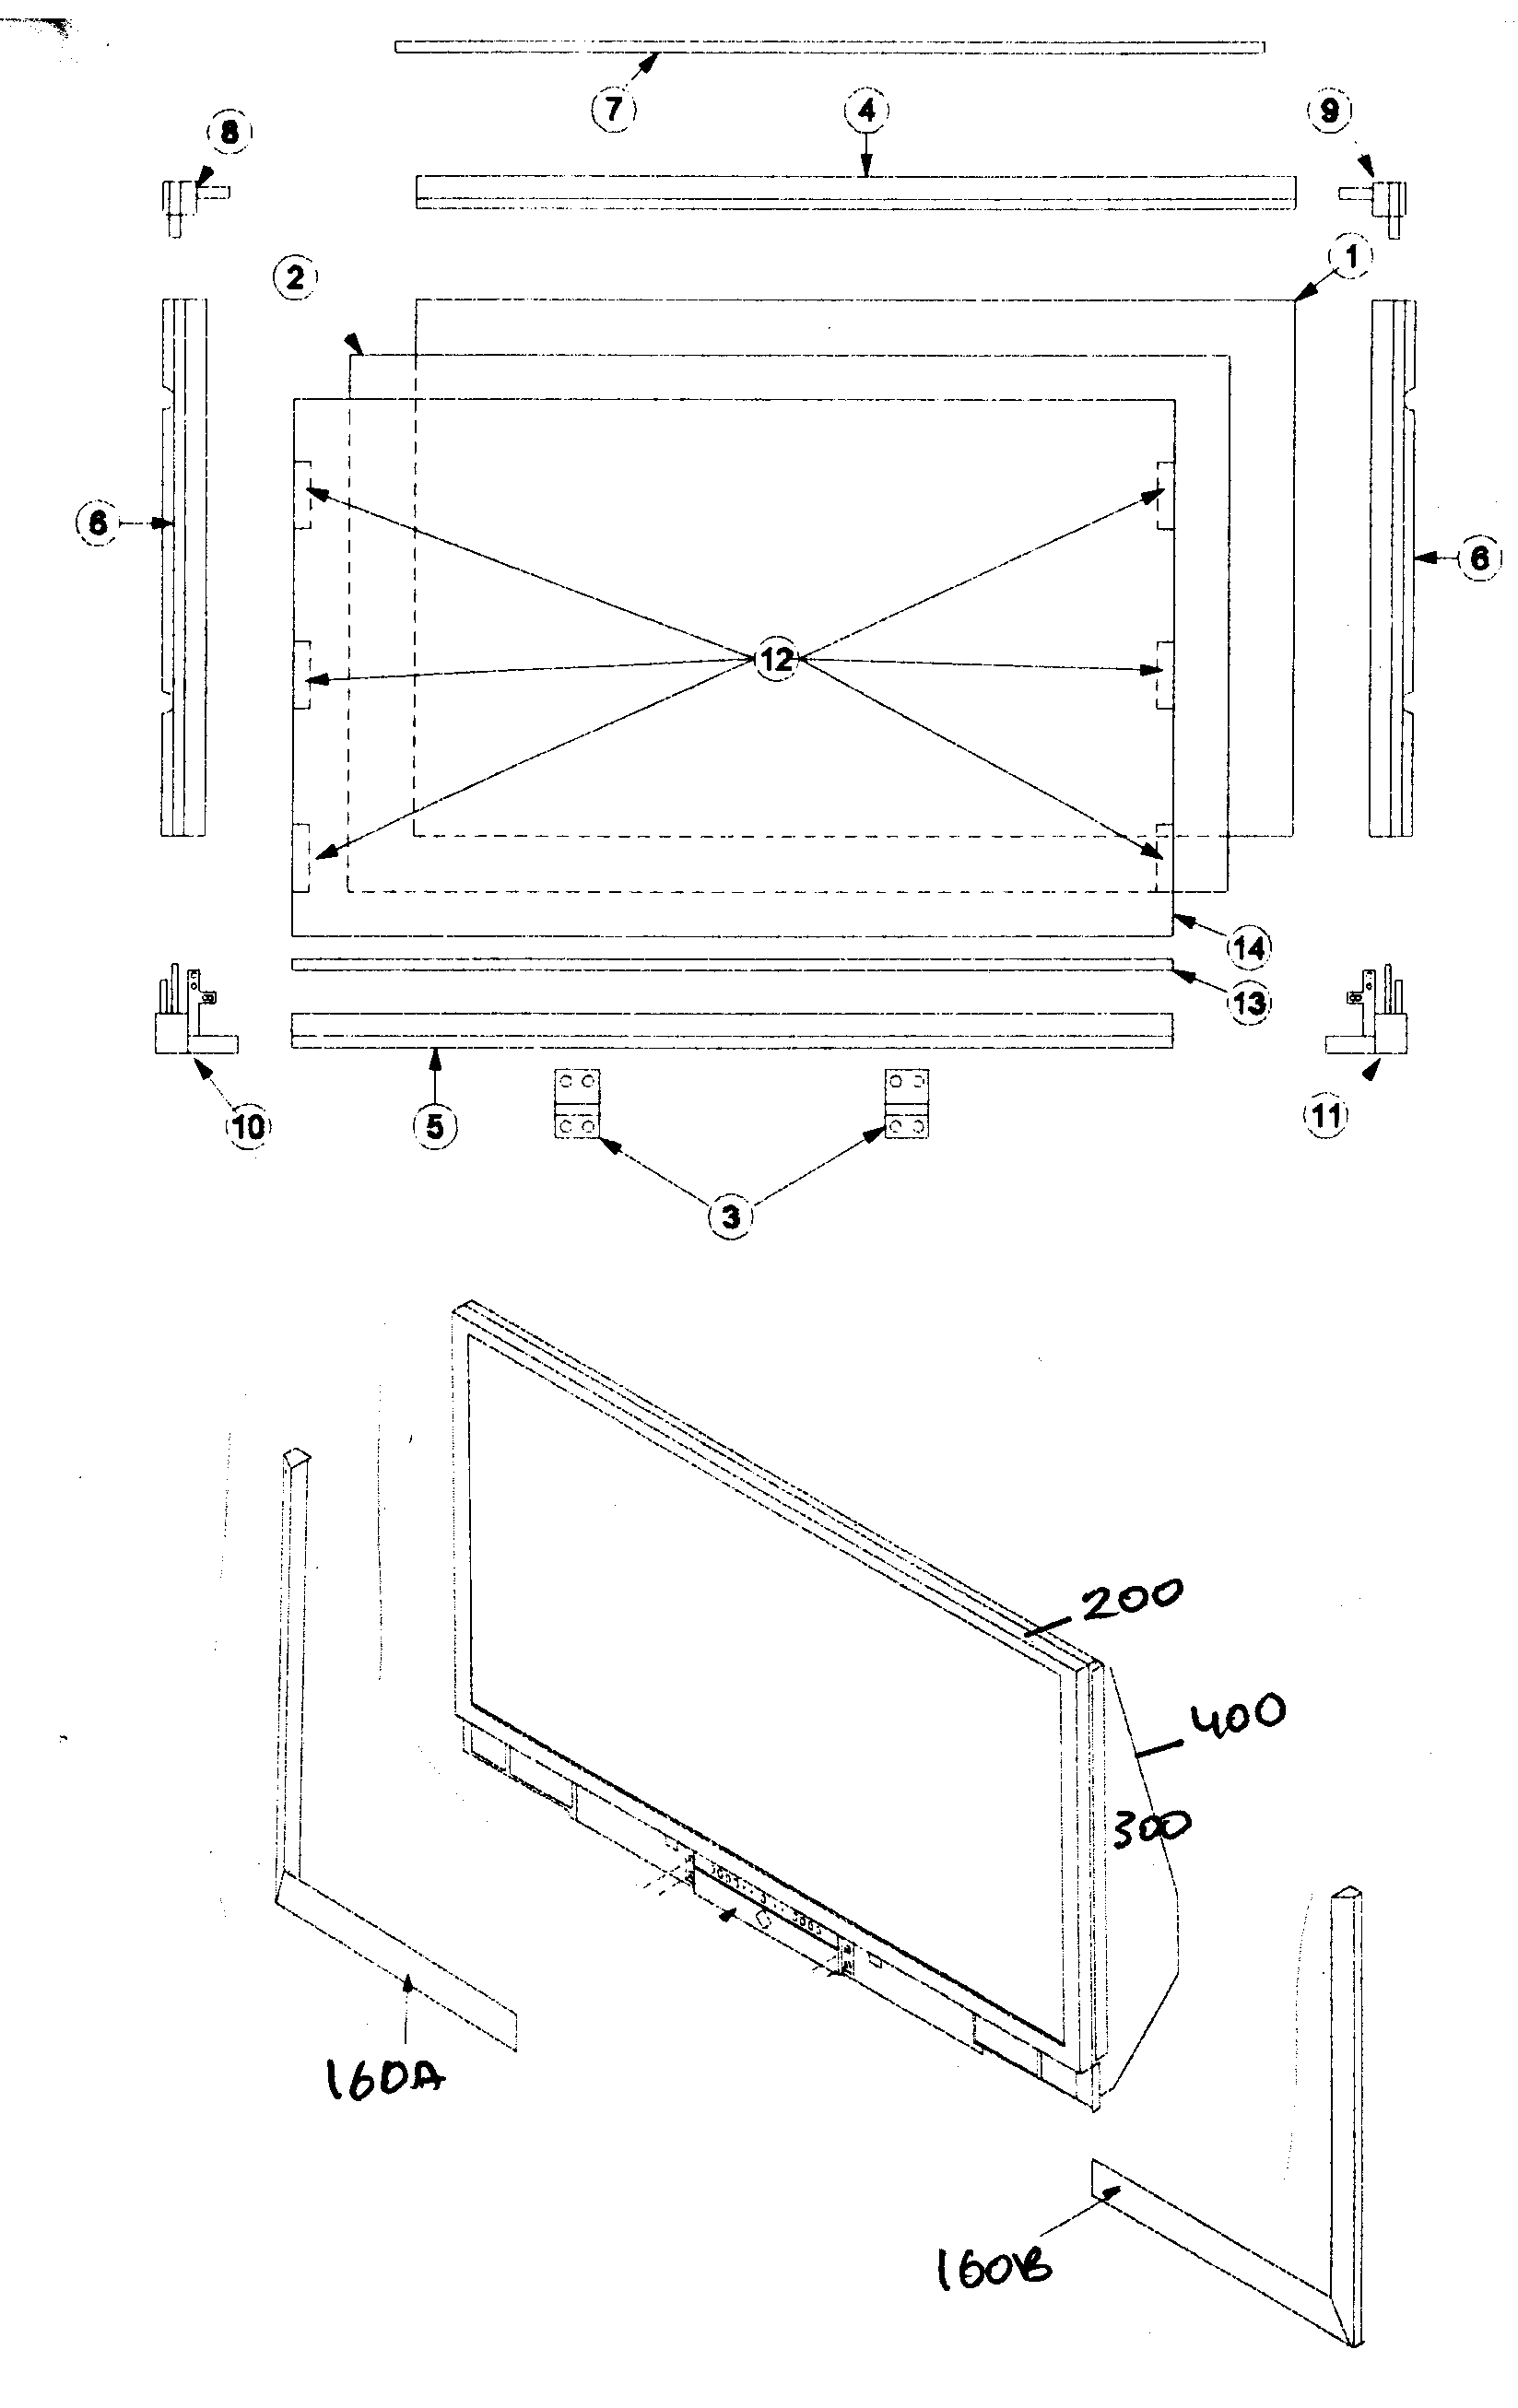 cda92773-59ae-4c3b-978a-df0d18d9d844_50027388-00001[1].png